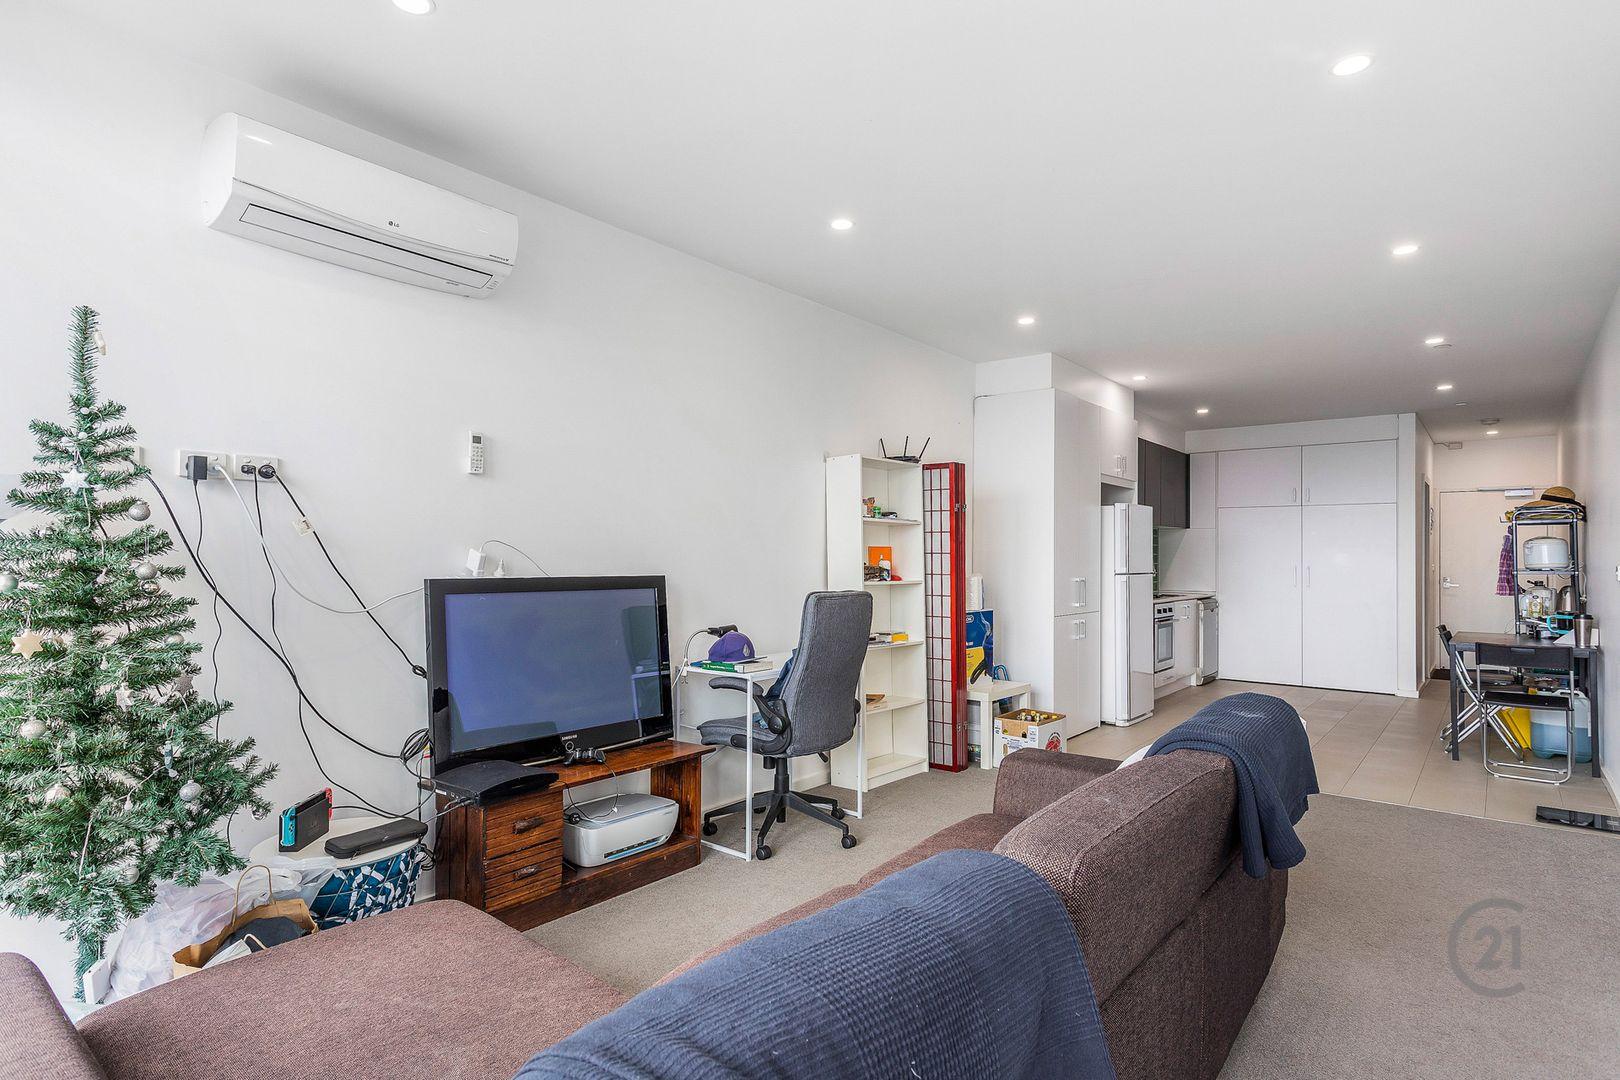 6/165 Sunshine Road, West Footscray VIC 3012, Image 1